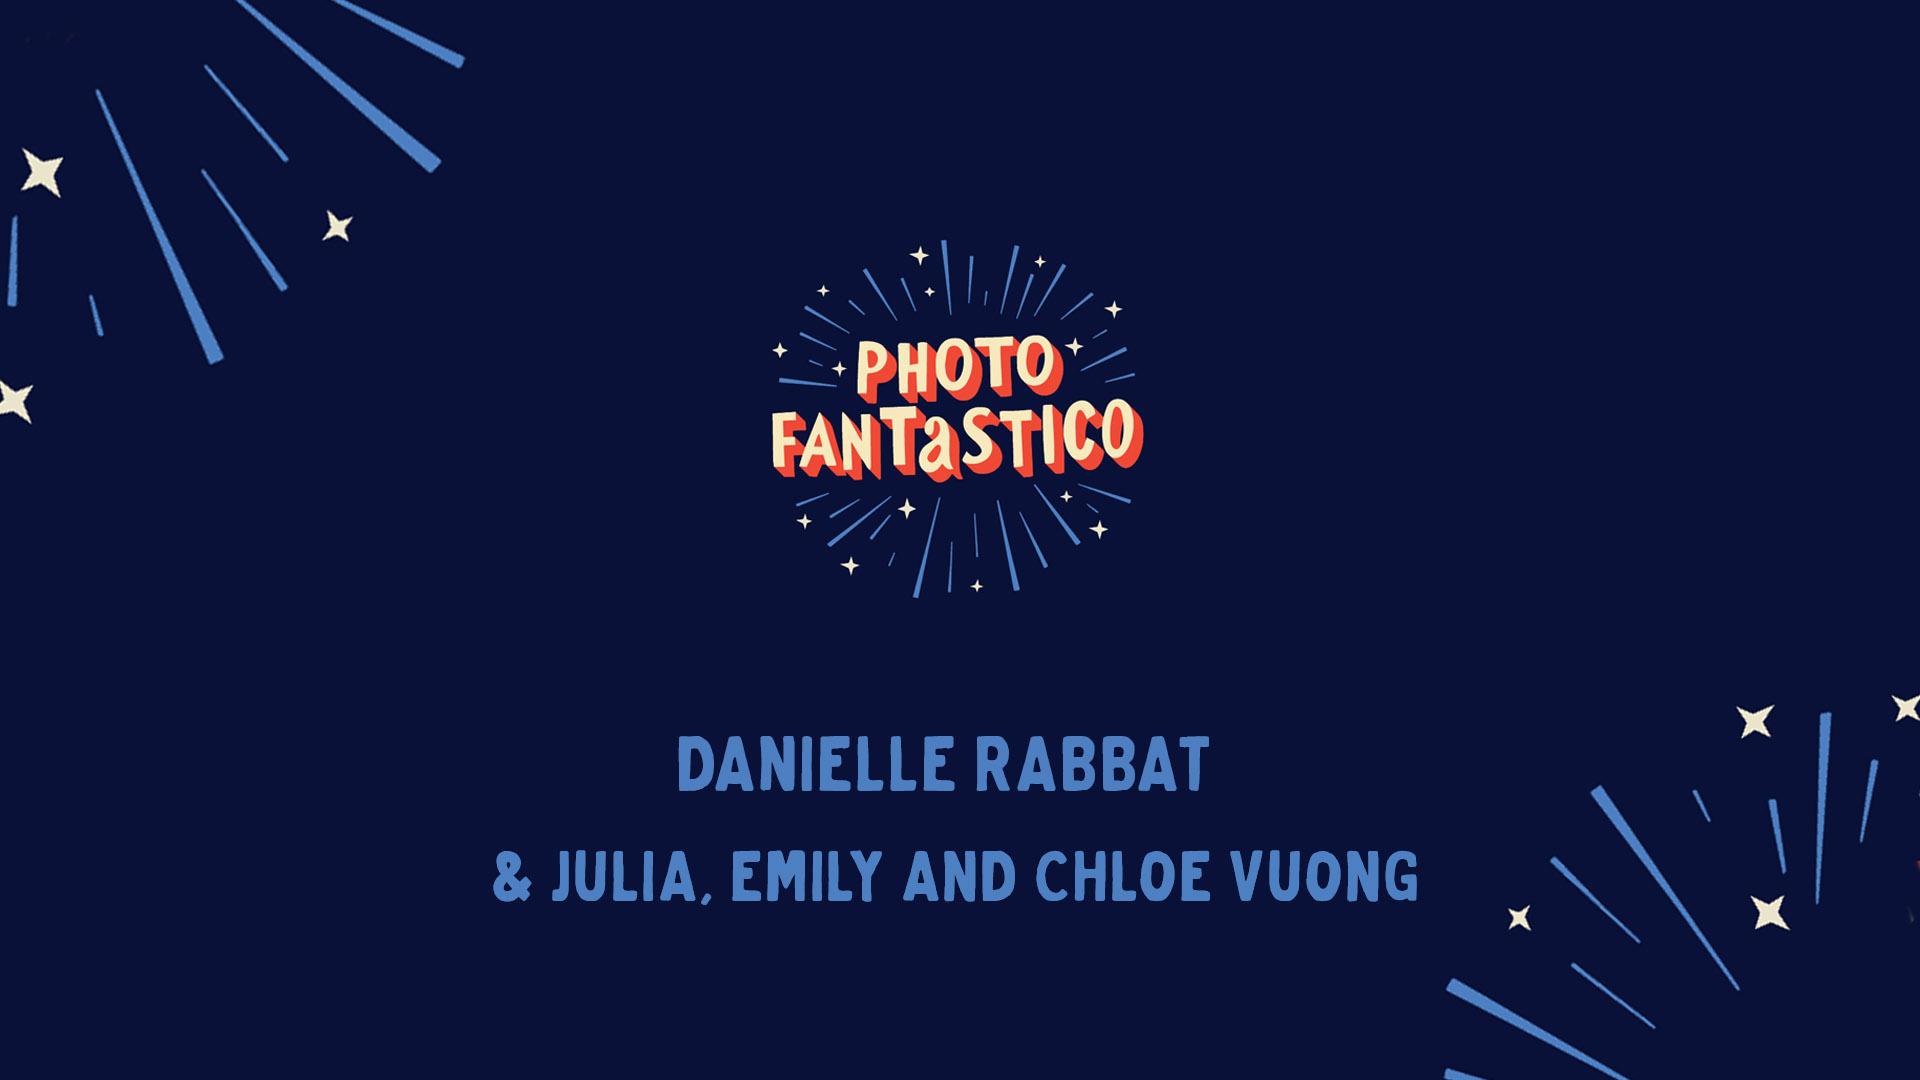 Danielle Rabbat